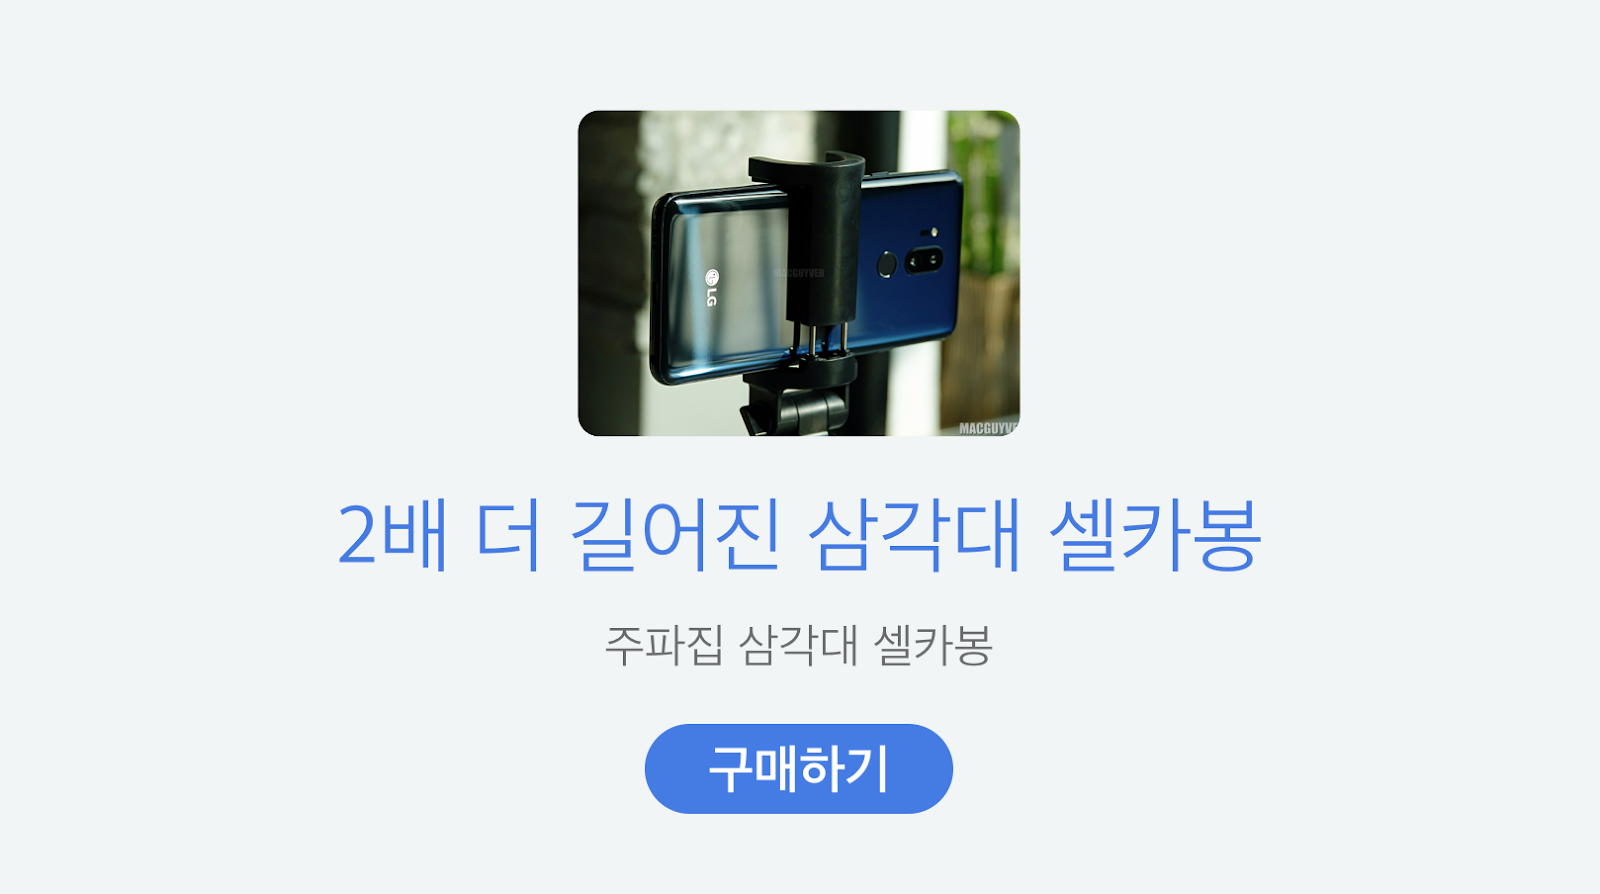 http://smartstore.naver.com/jupazip/products/2846533188